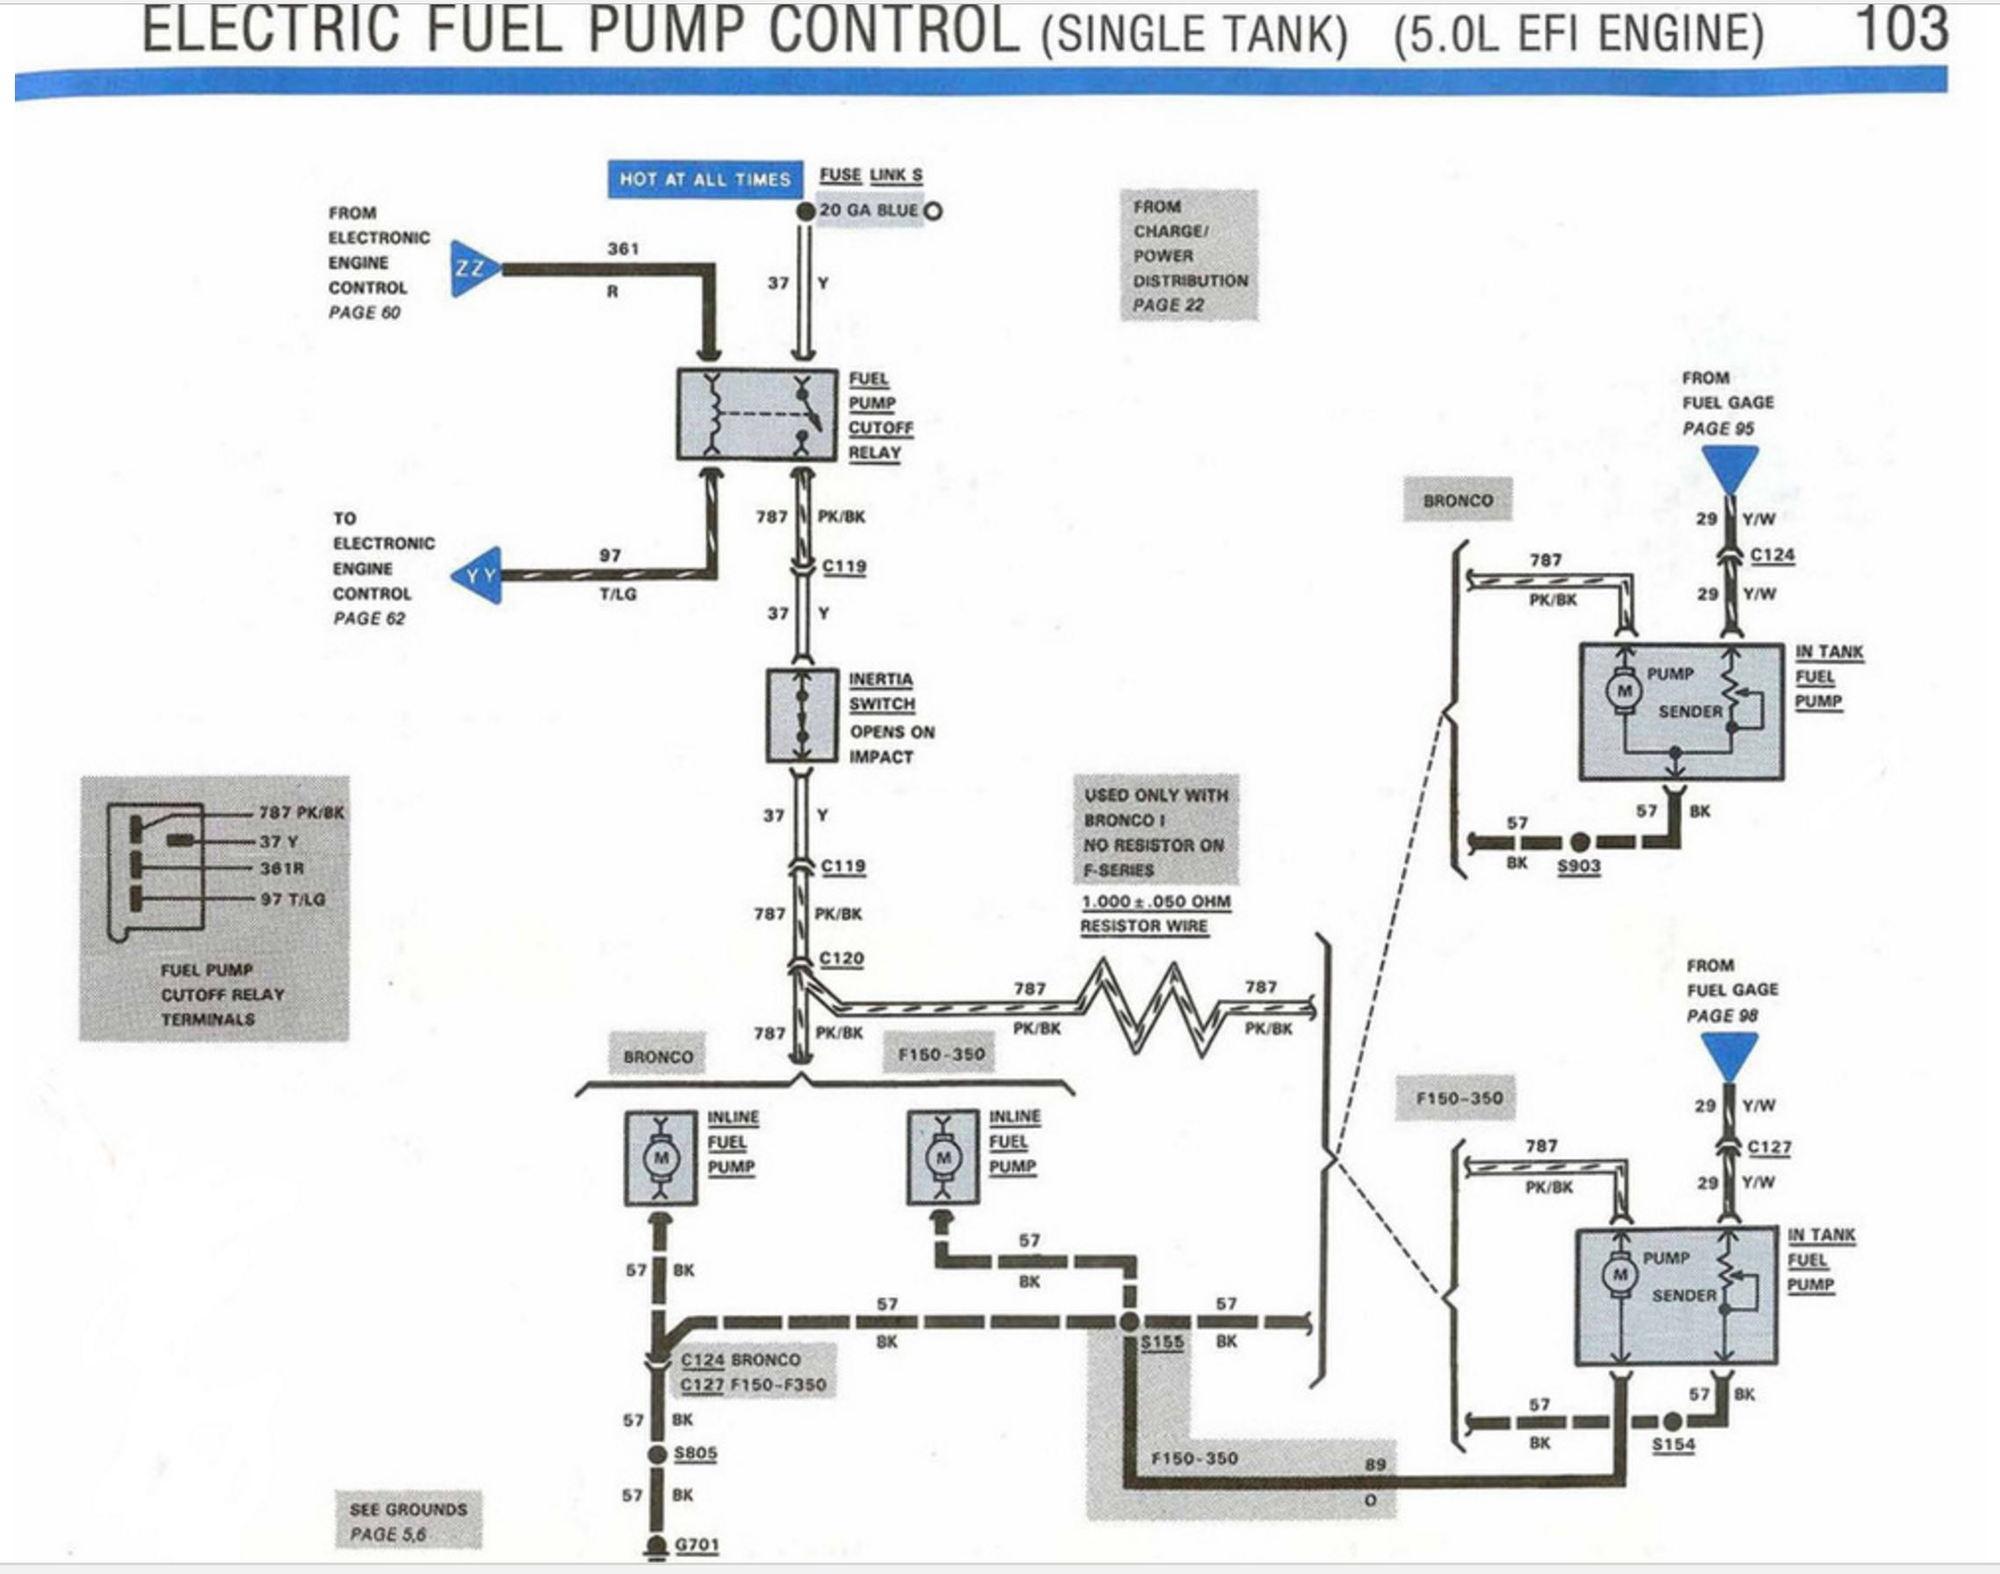 86 ford f 150 fuel pump relay location